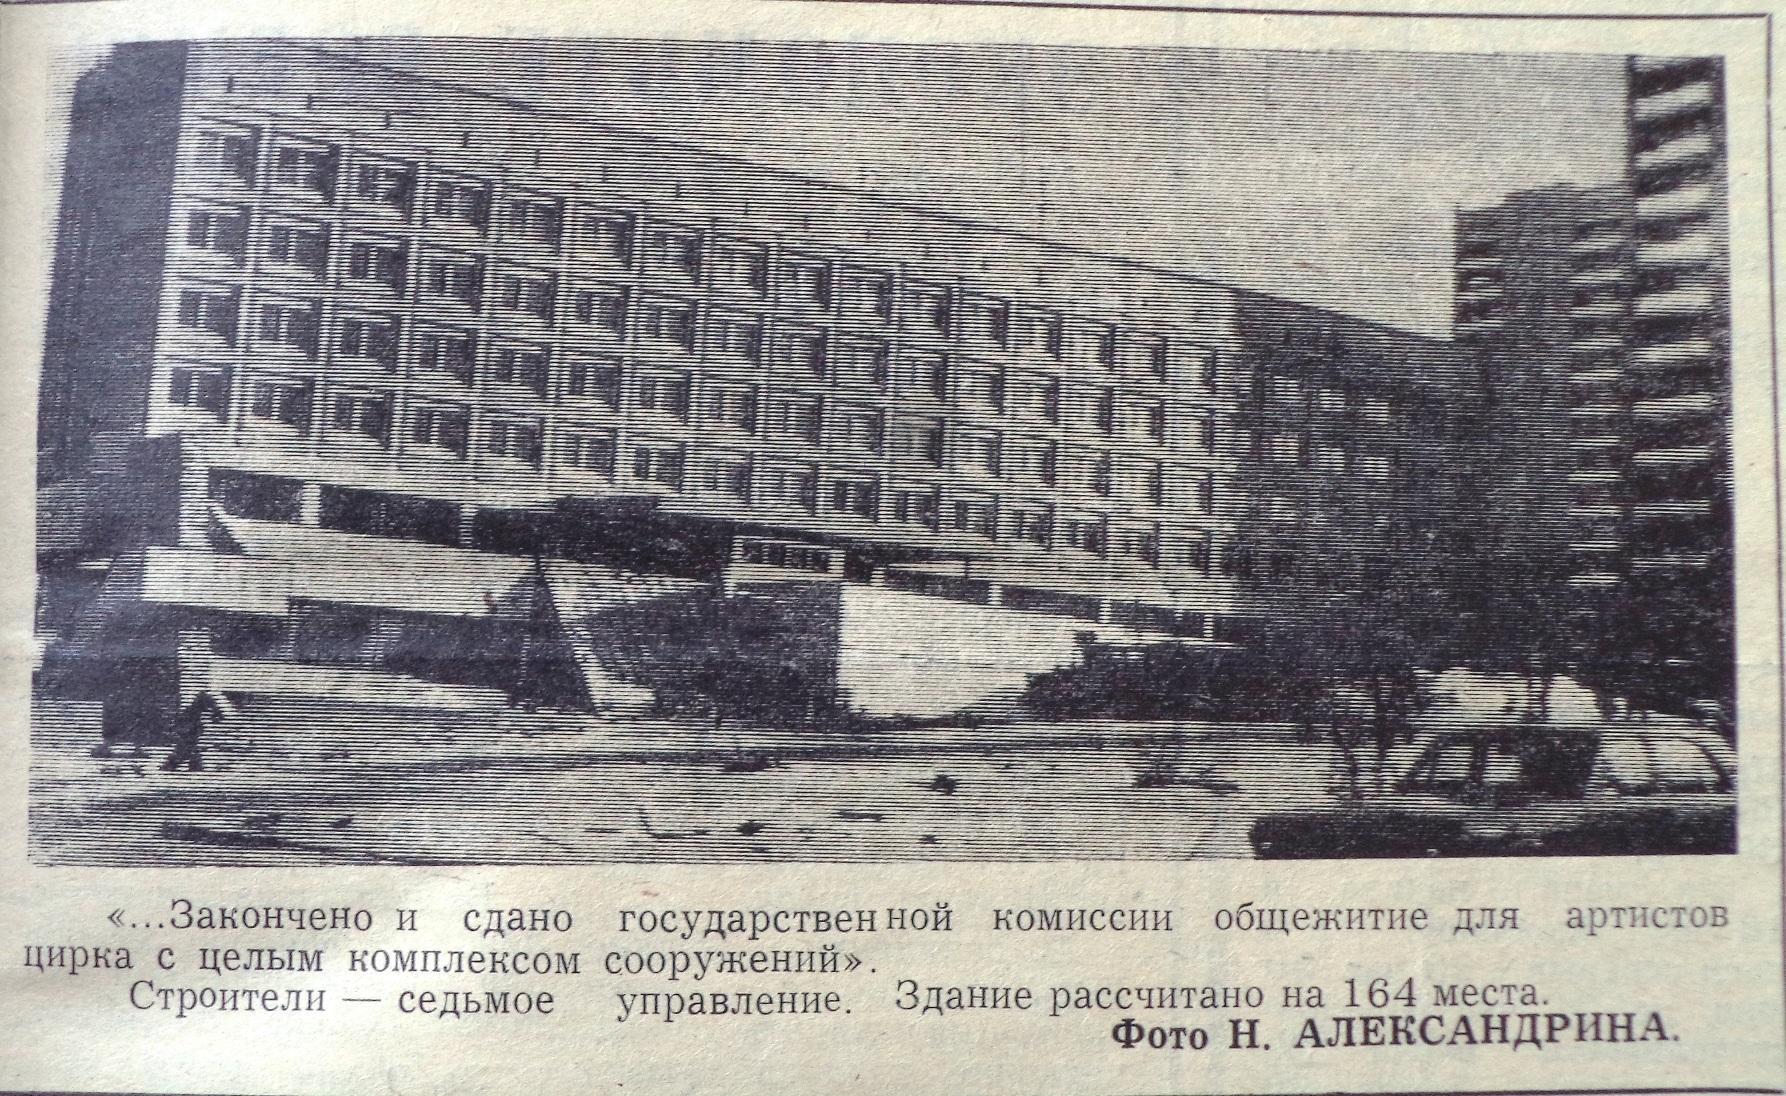 Полевая-ФОТО-60-За Передовую Стройку-1977-5 января-2